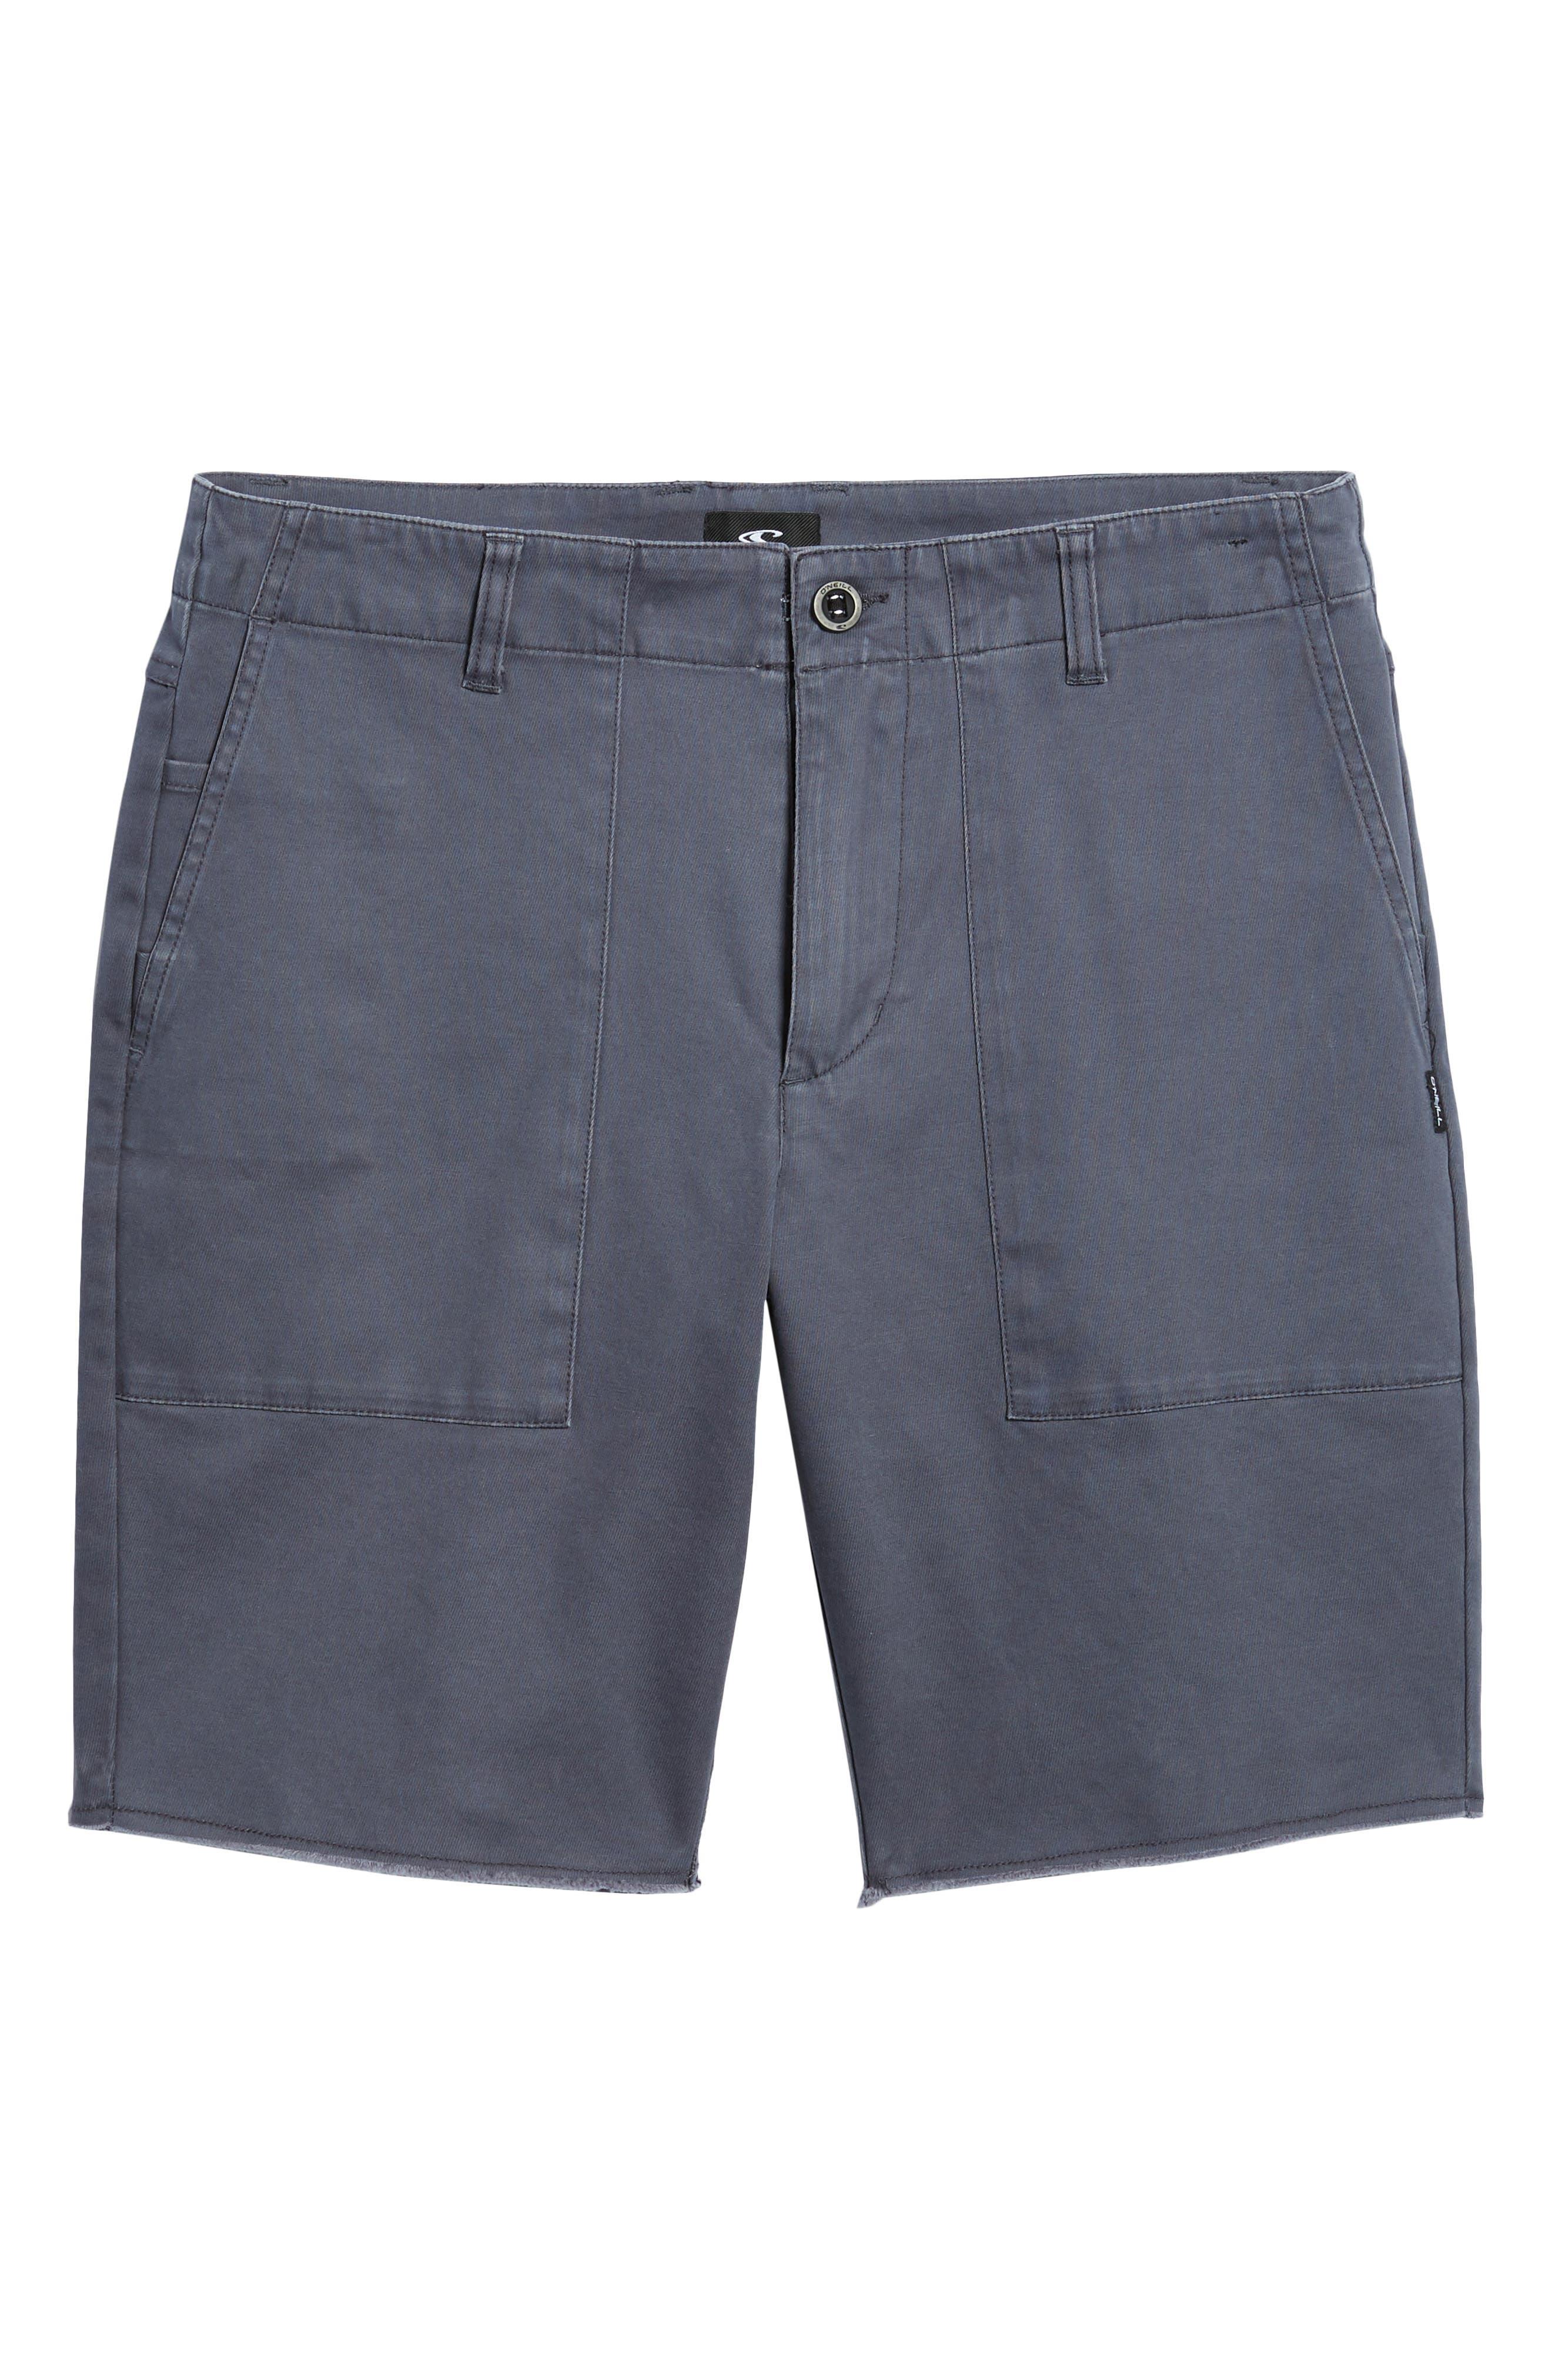 Naples Camp Shorts,                             Alternate thumbnail 14, color,